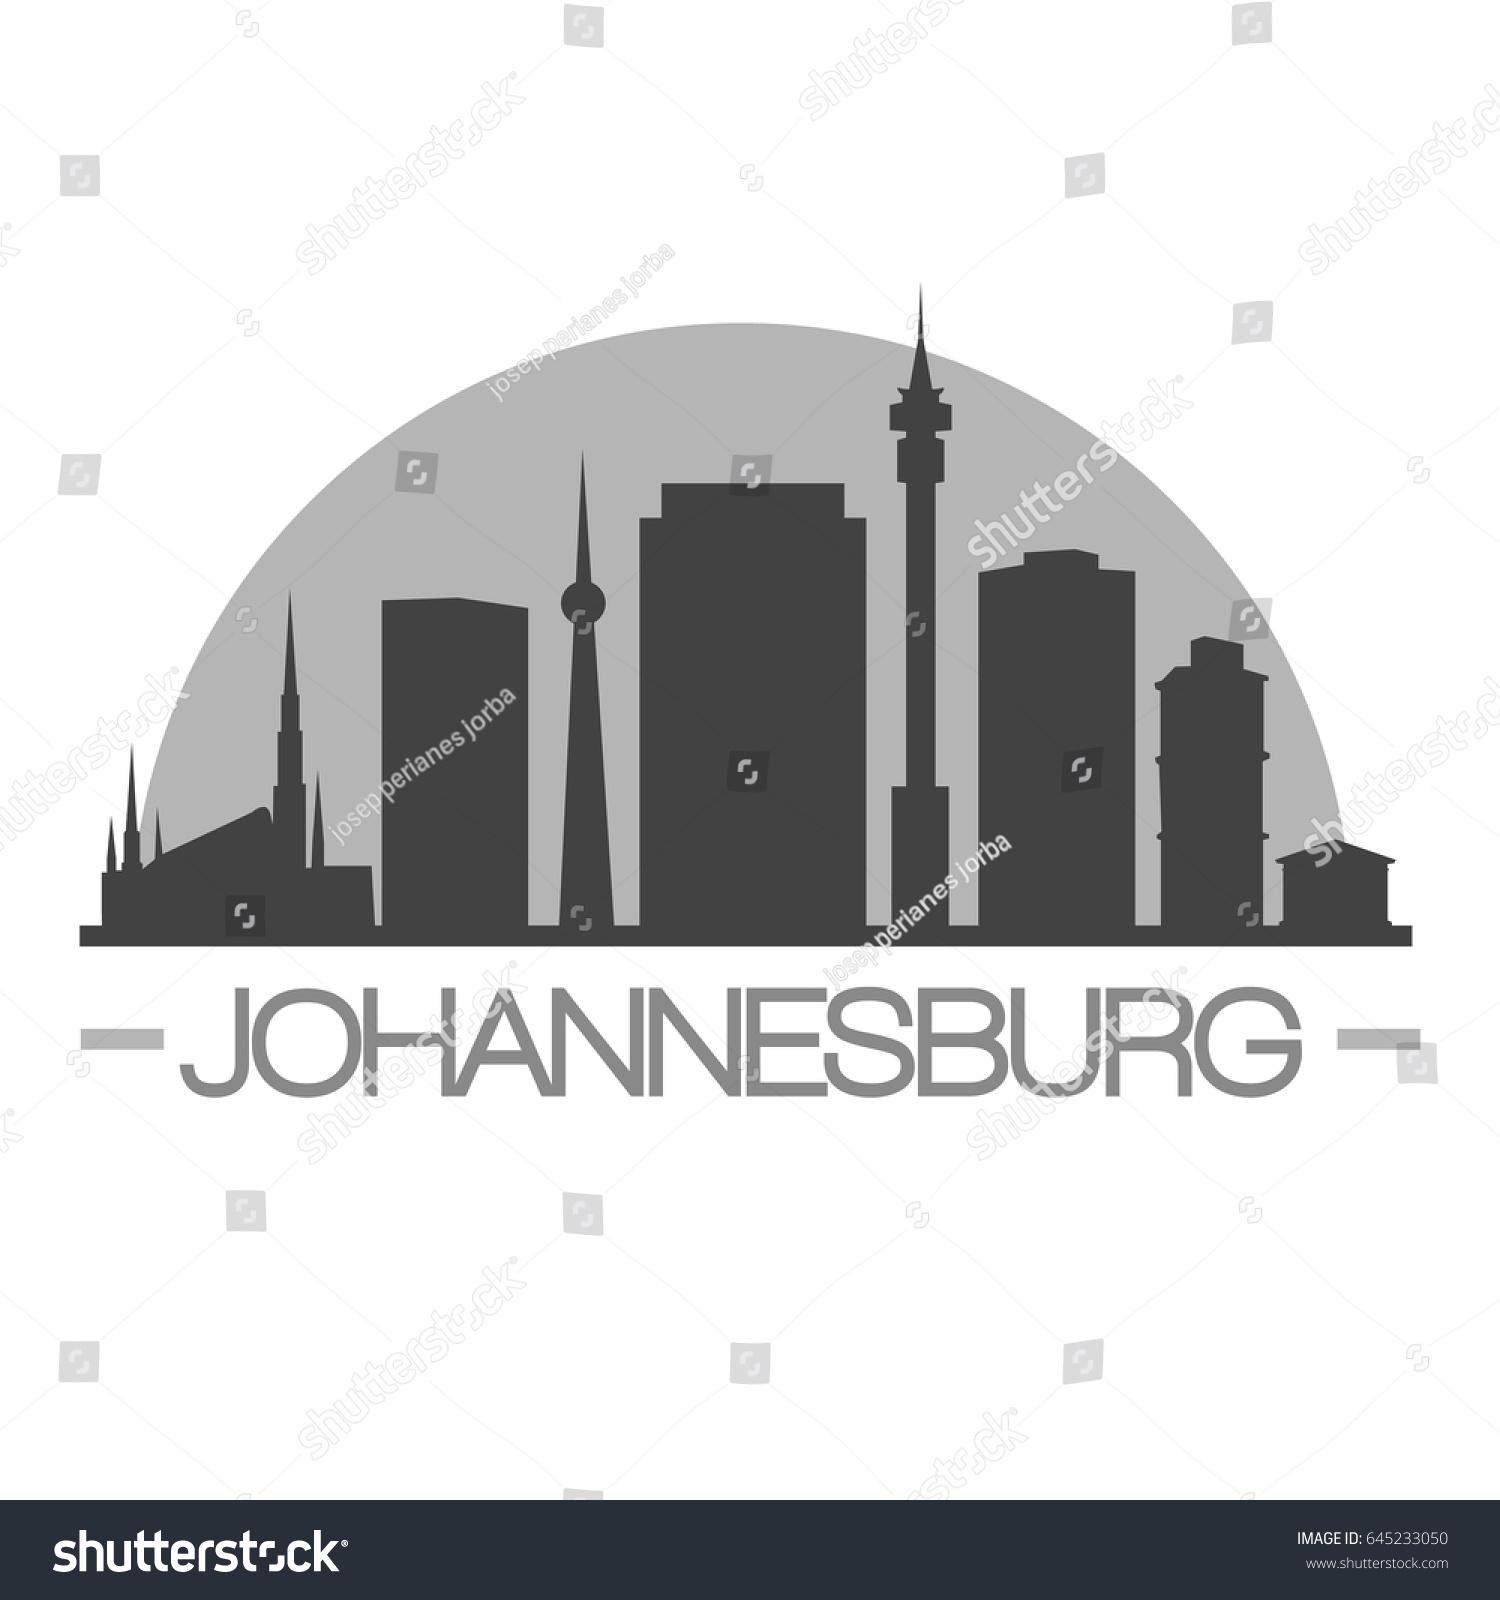 Johannesburg skyline vector illustration linear johannesburg south johannesburg skyline silhouette skyline stamp vector city design thecheapjerseys Image collections